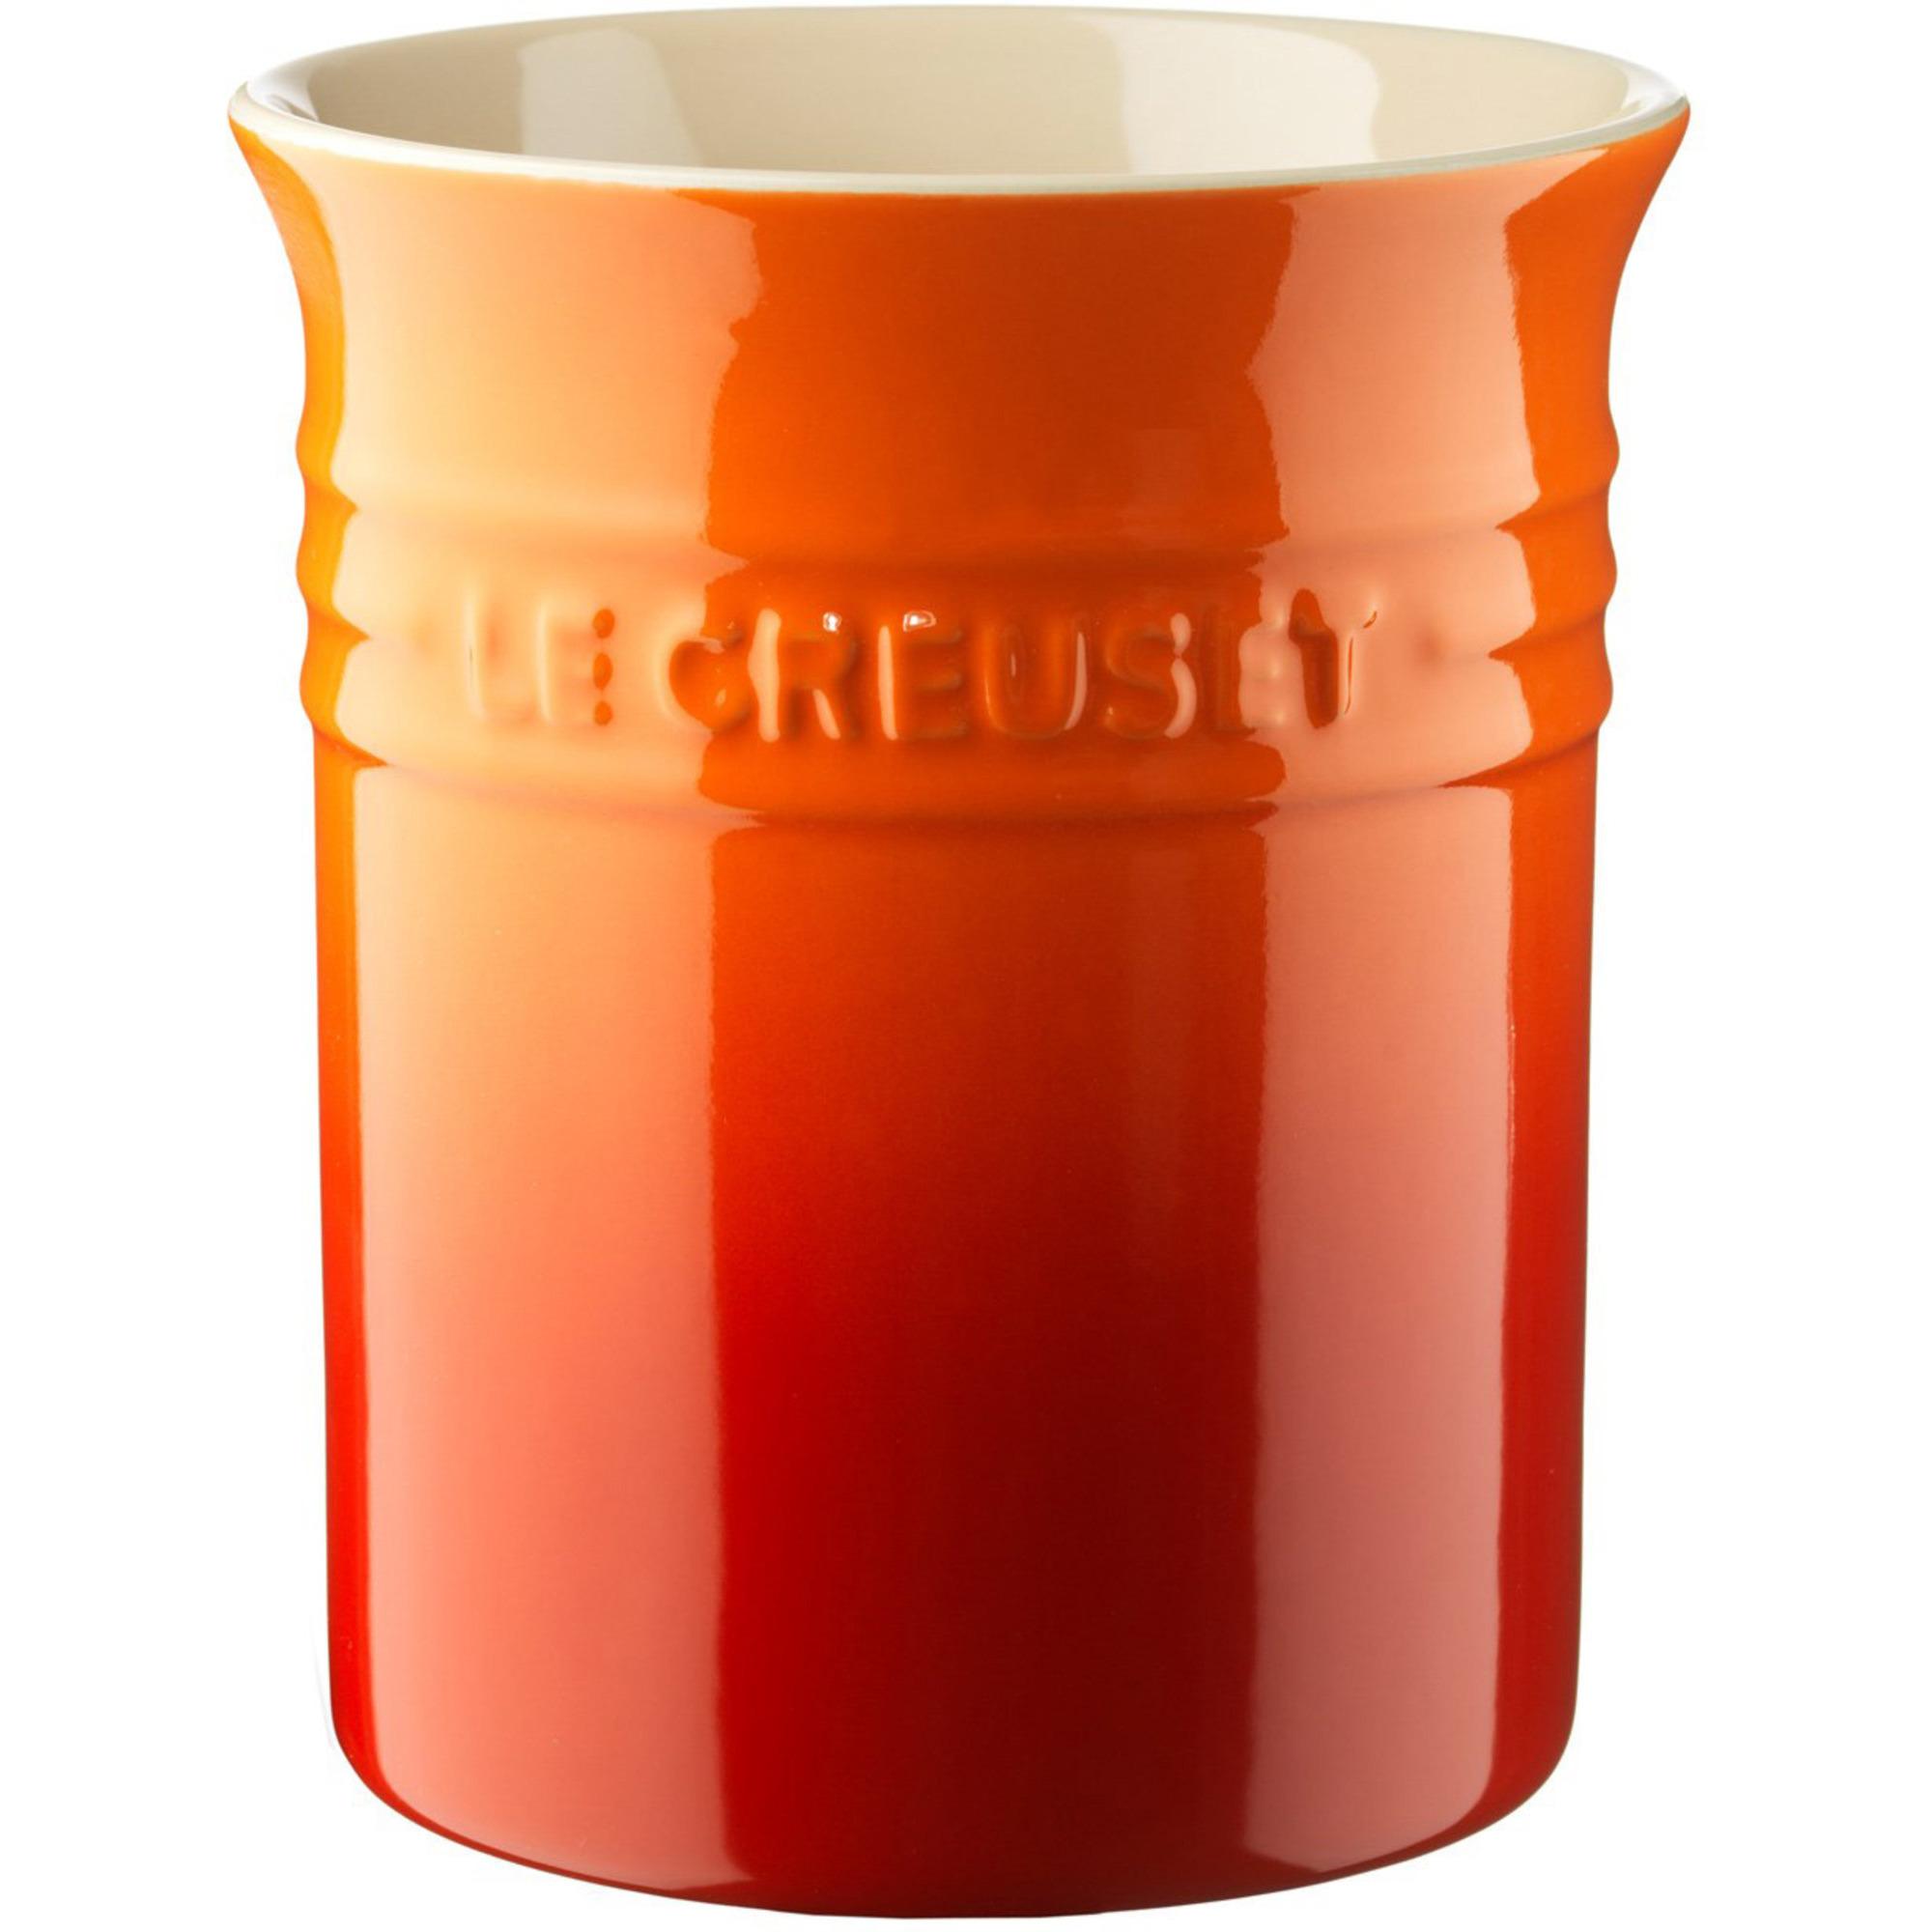 Le Creuset Redskapskrus 11 liter Vulkan